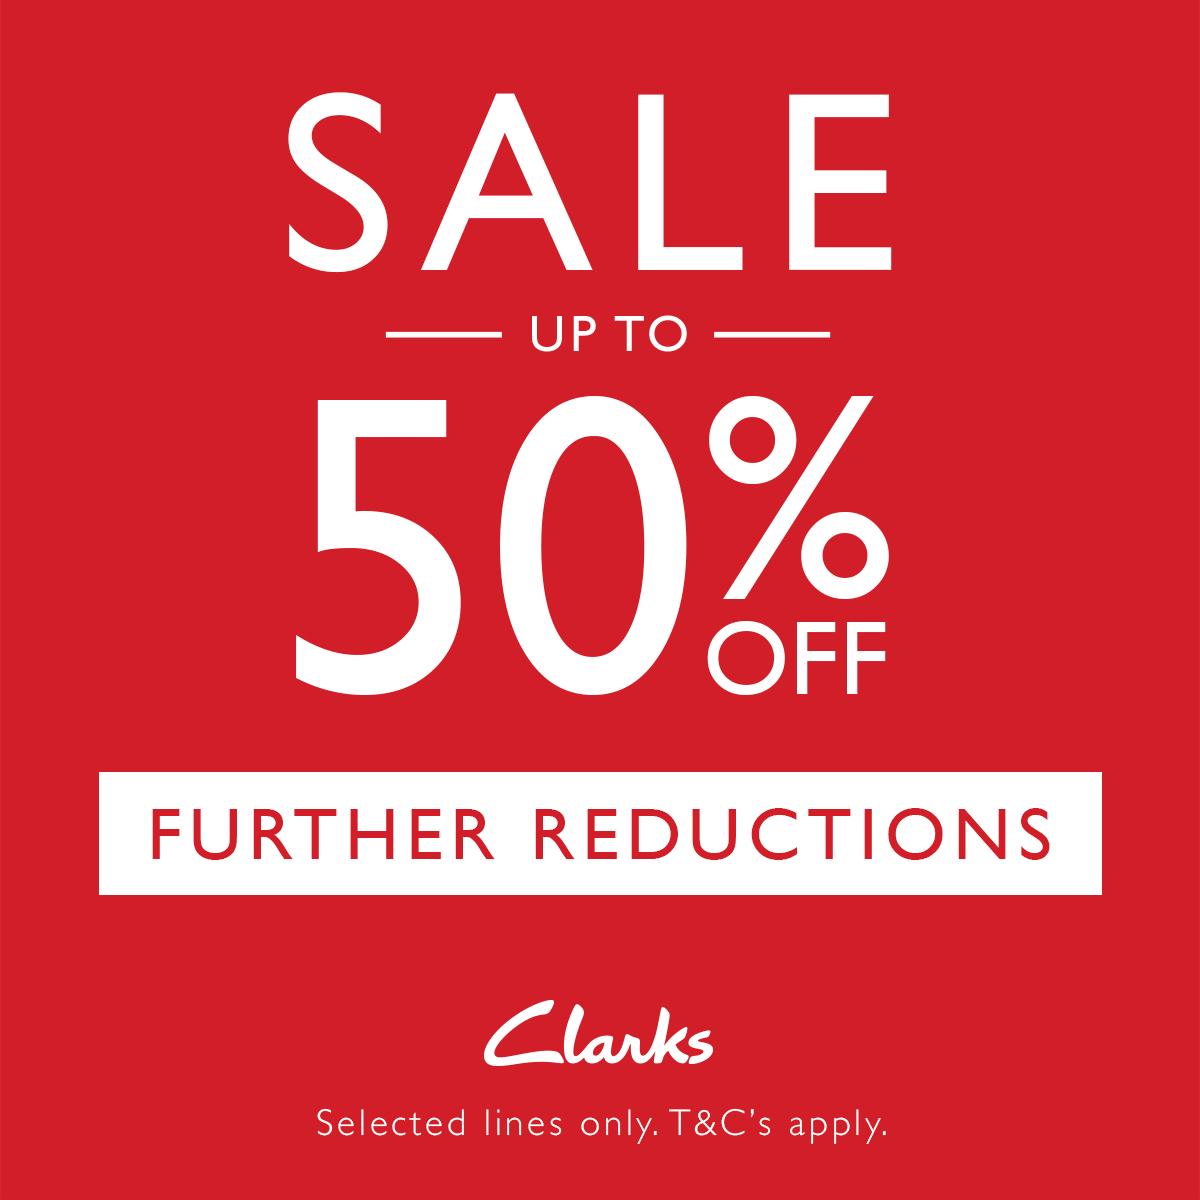 Clarks_Sale_50_Off